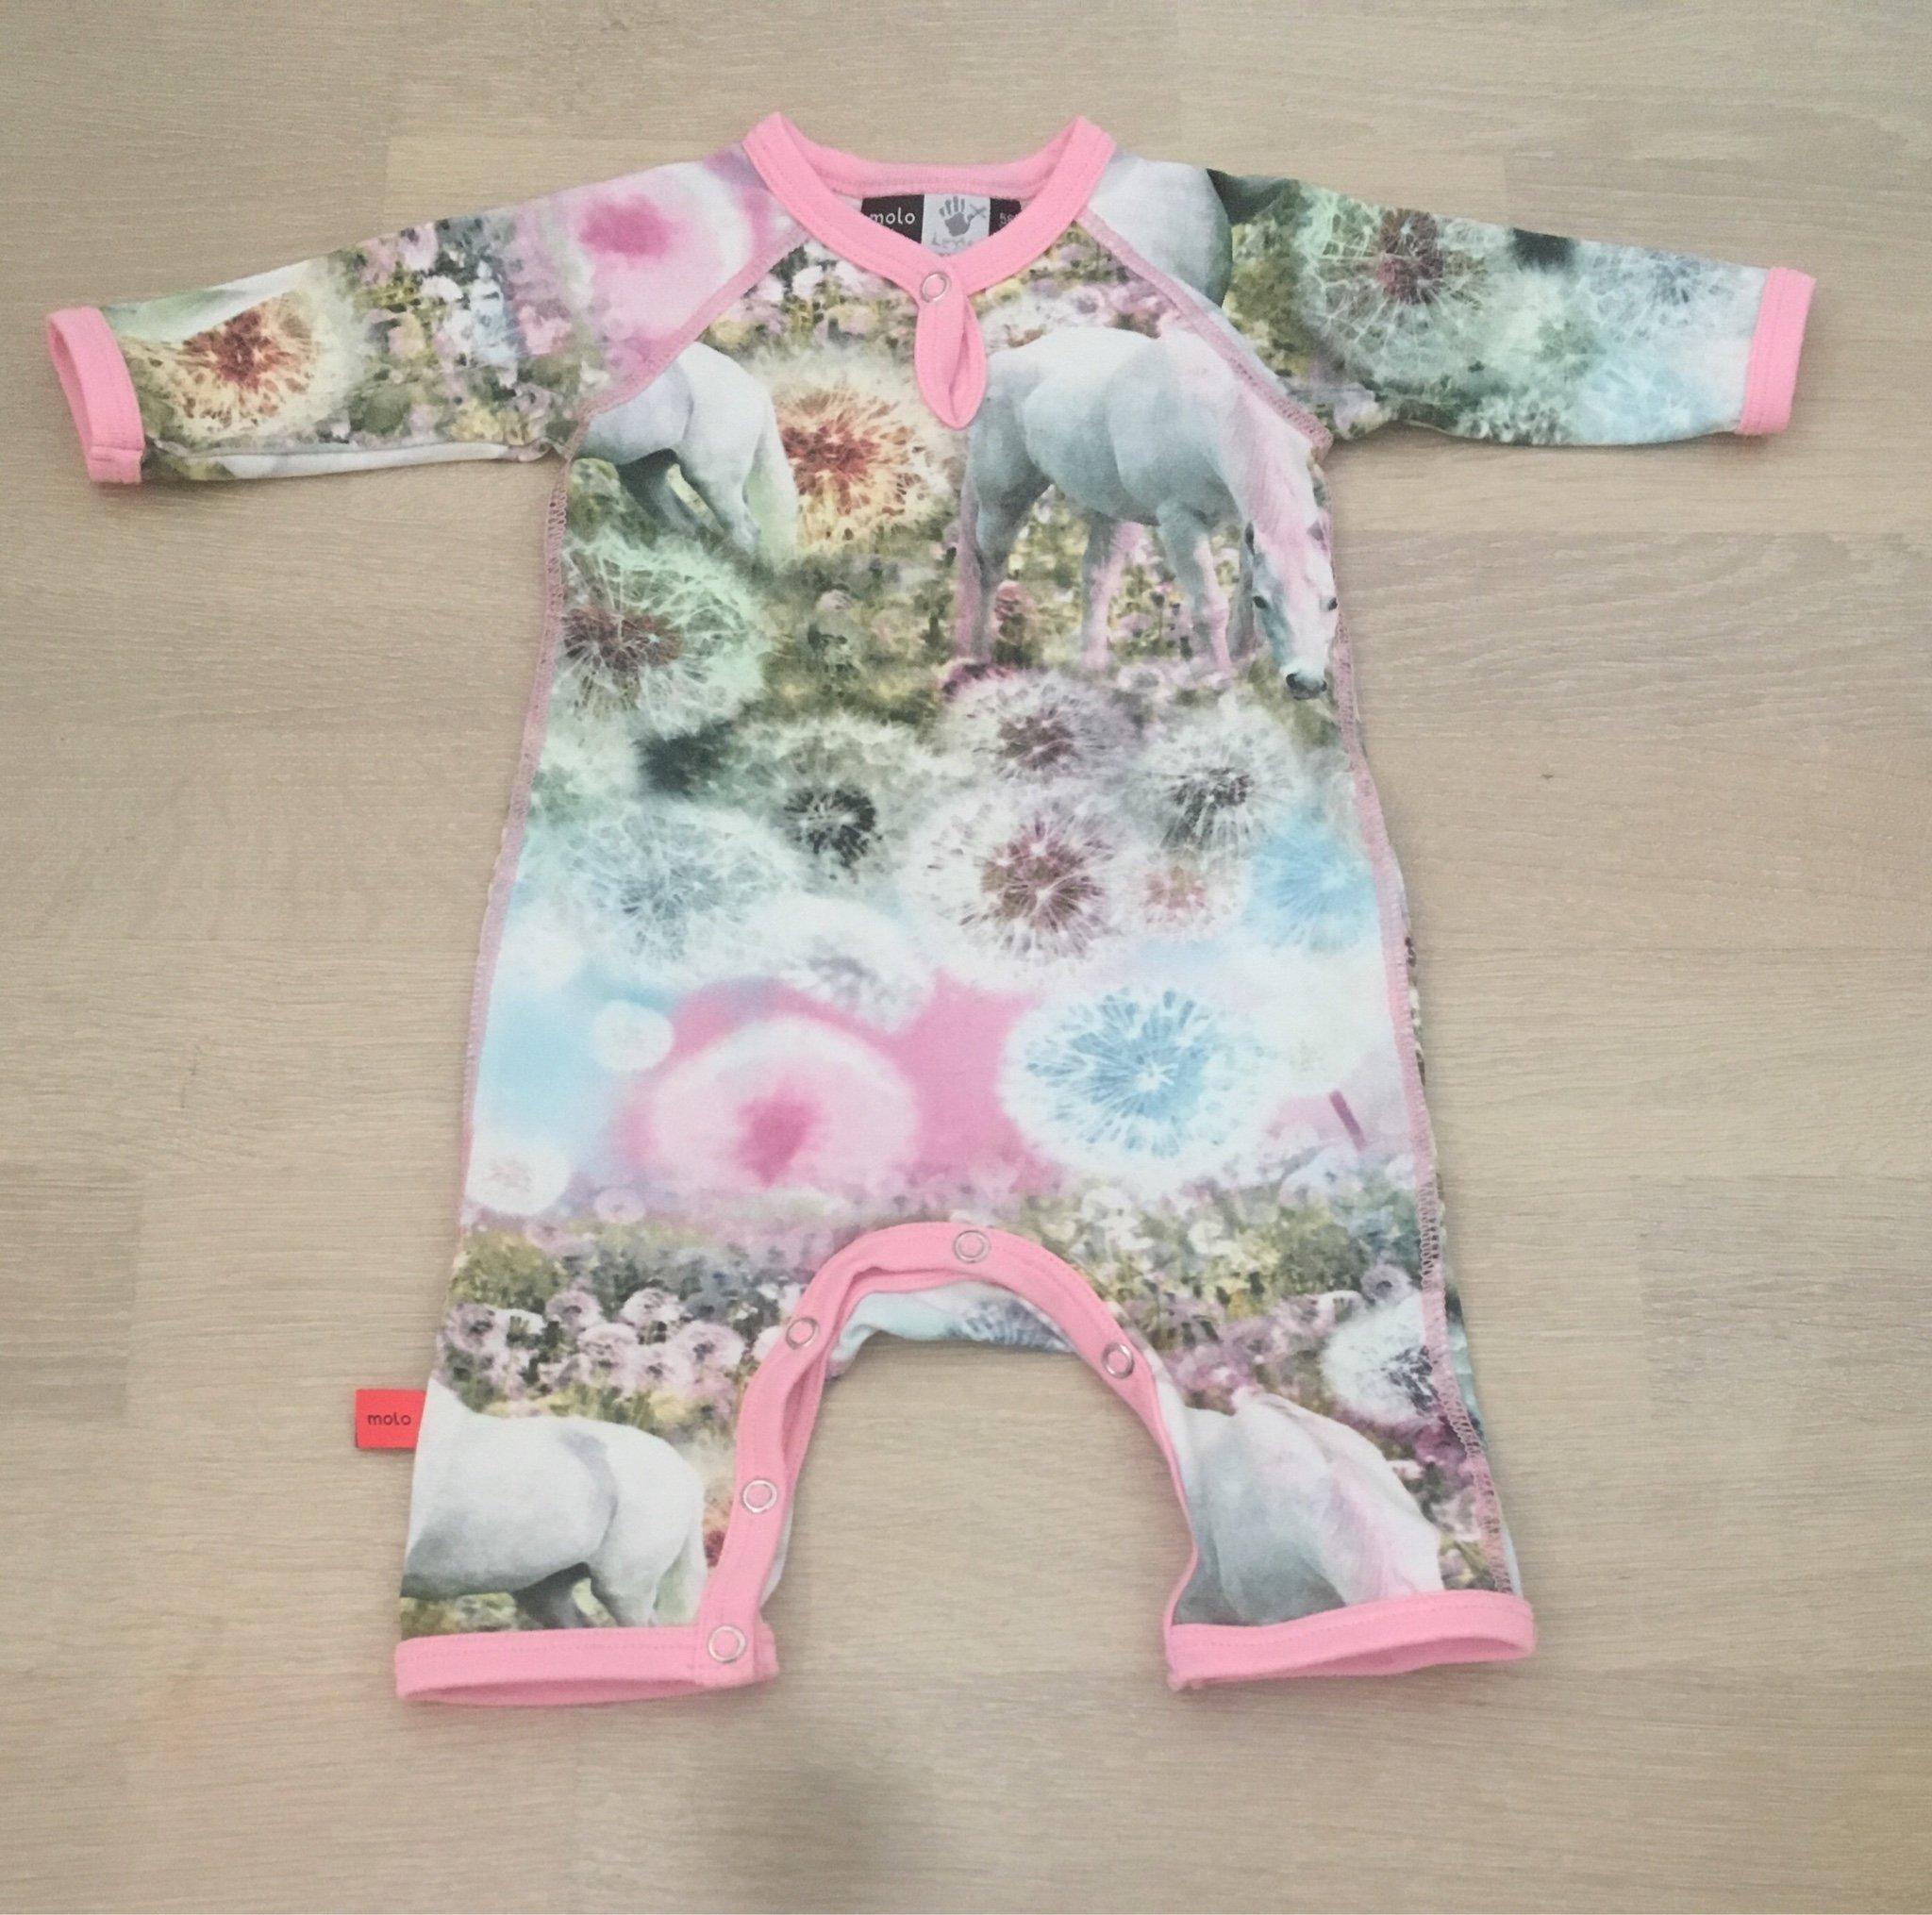 7e1a4c7cff25 Heldress från Molo i stl 56 jumpsuit pyjamas da.. (347349694) ᐈ Köp ...